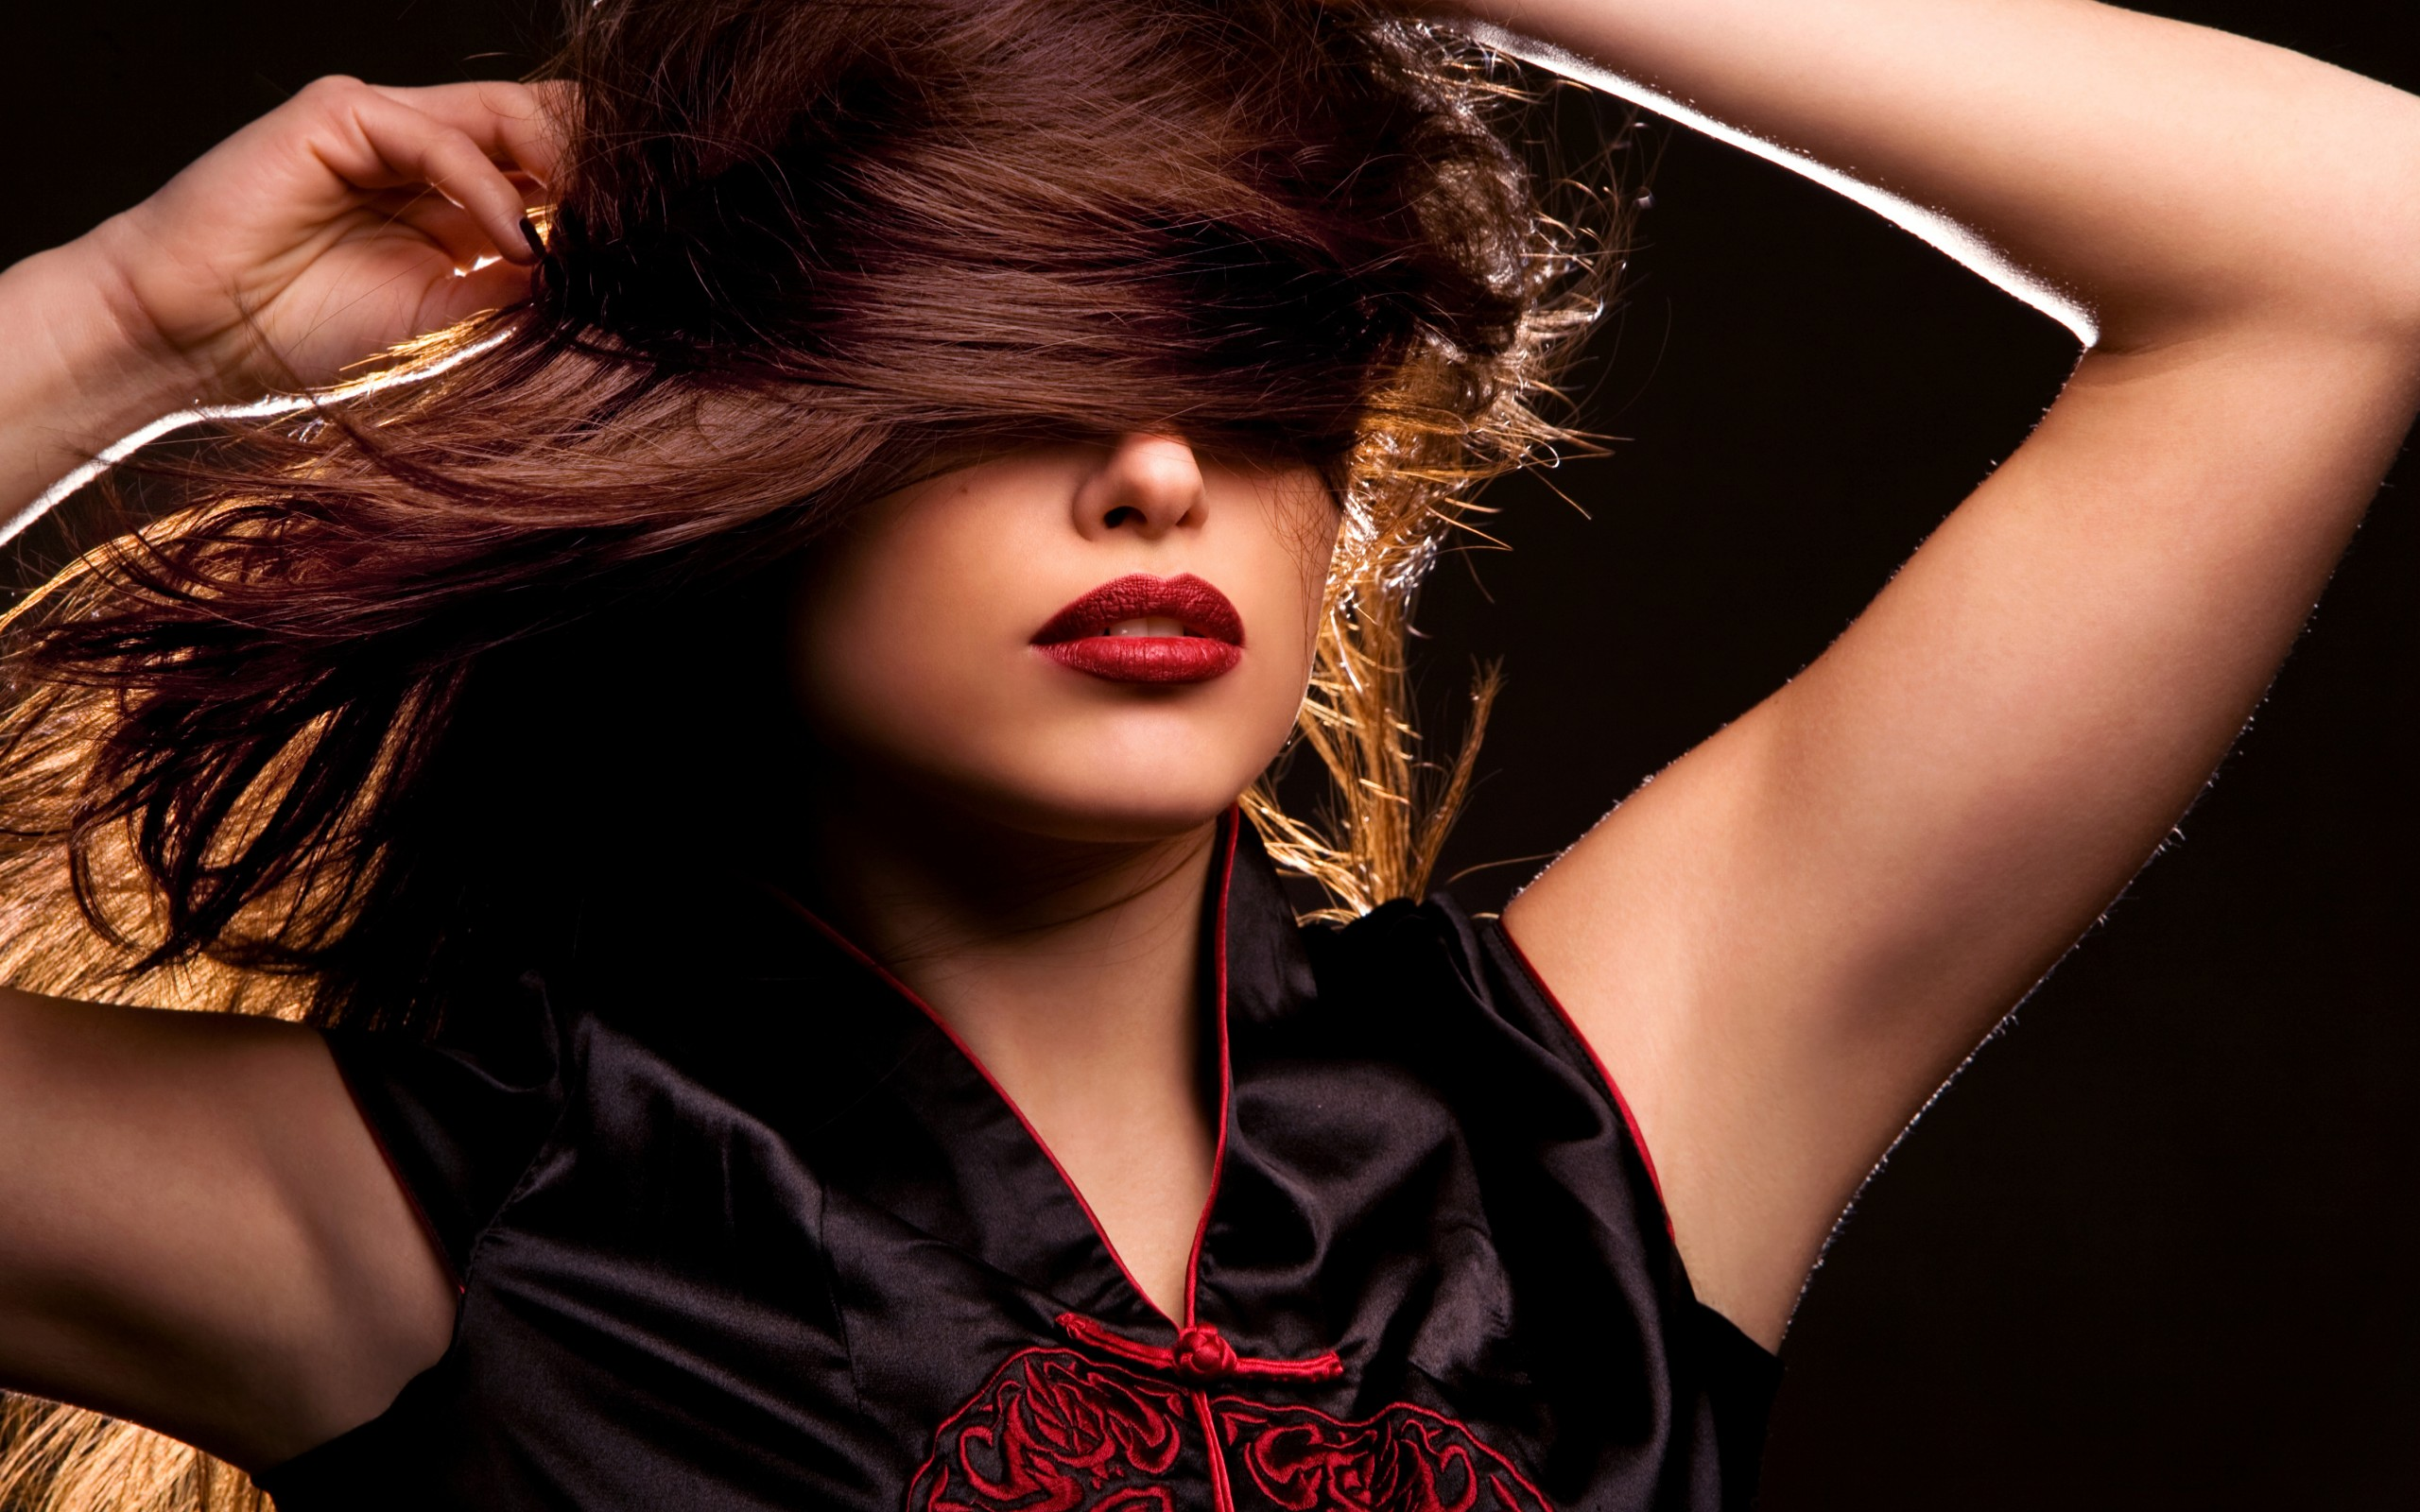 Фото девушек с дерзкими волосами